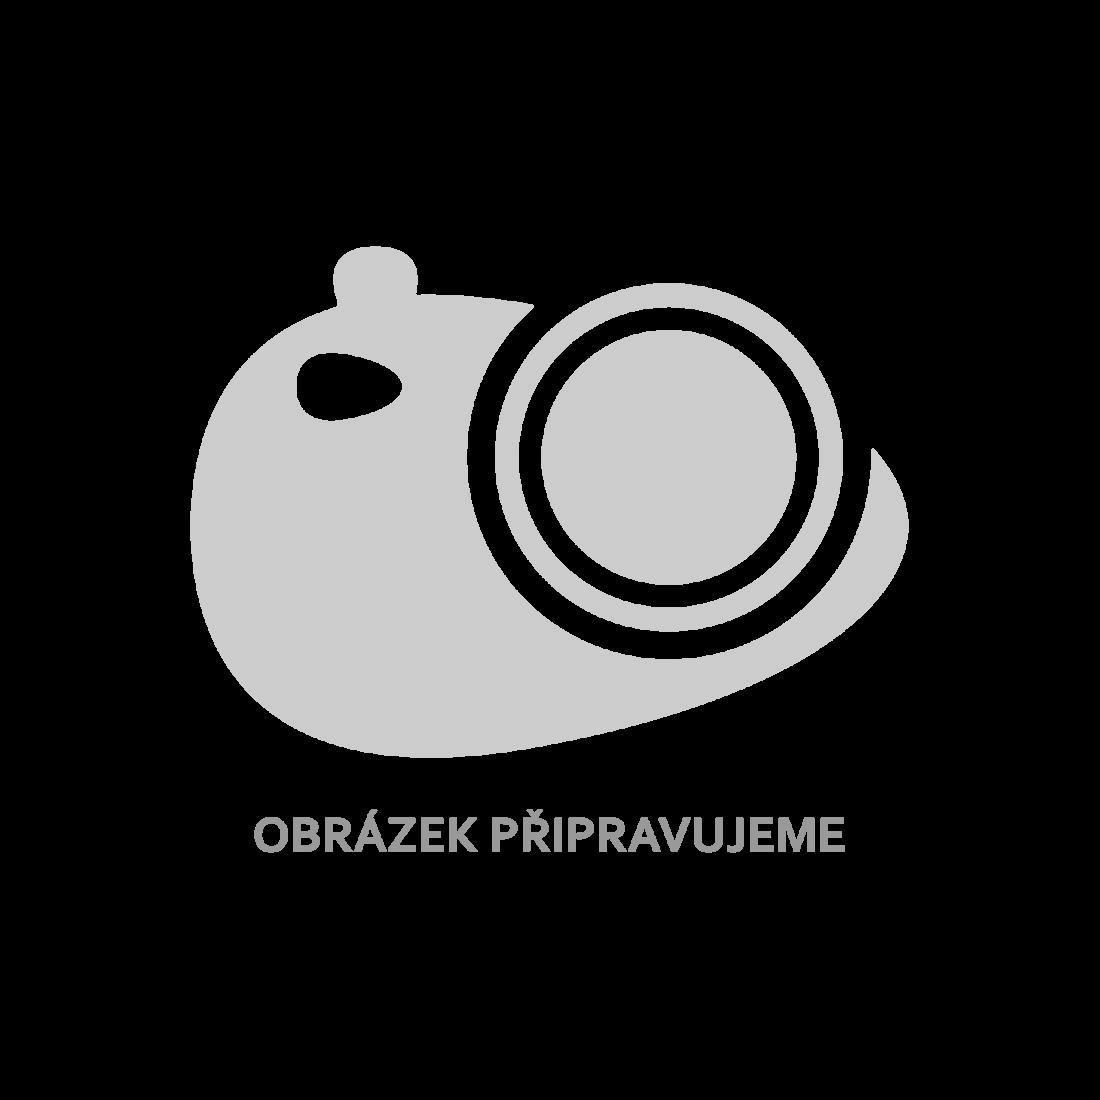 vidaXL Knihovna šedá 90 x 30 x 90 cm dřevotříska [802932]